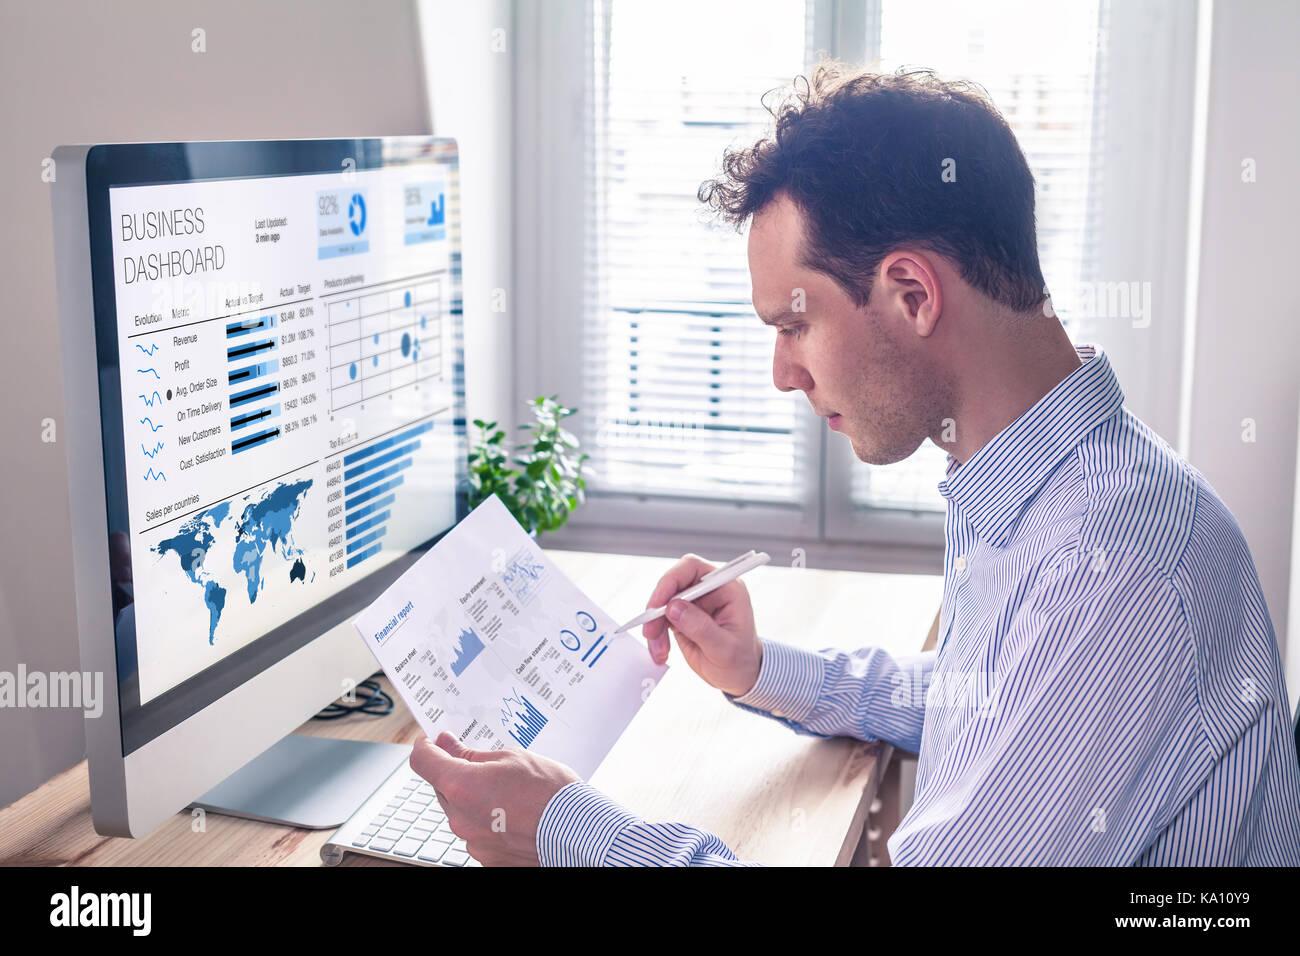 Businessman working with dashboard and key performance indicator (KPI) metrics, business intelligence (BI) graph - Stock Image